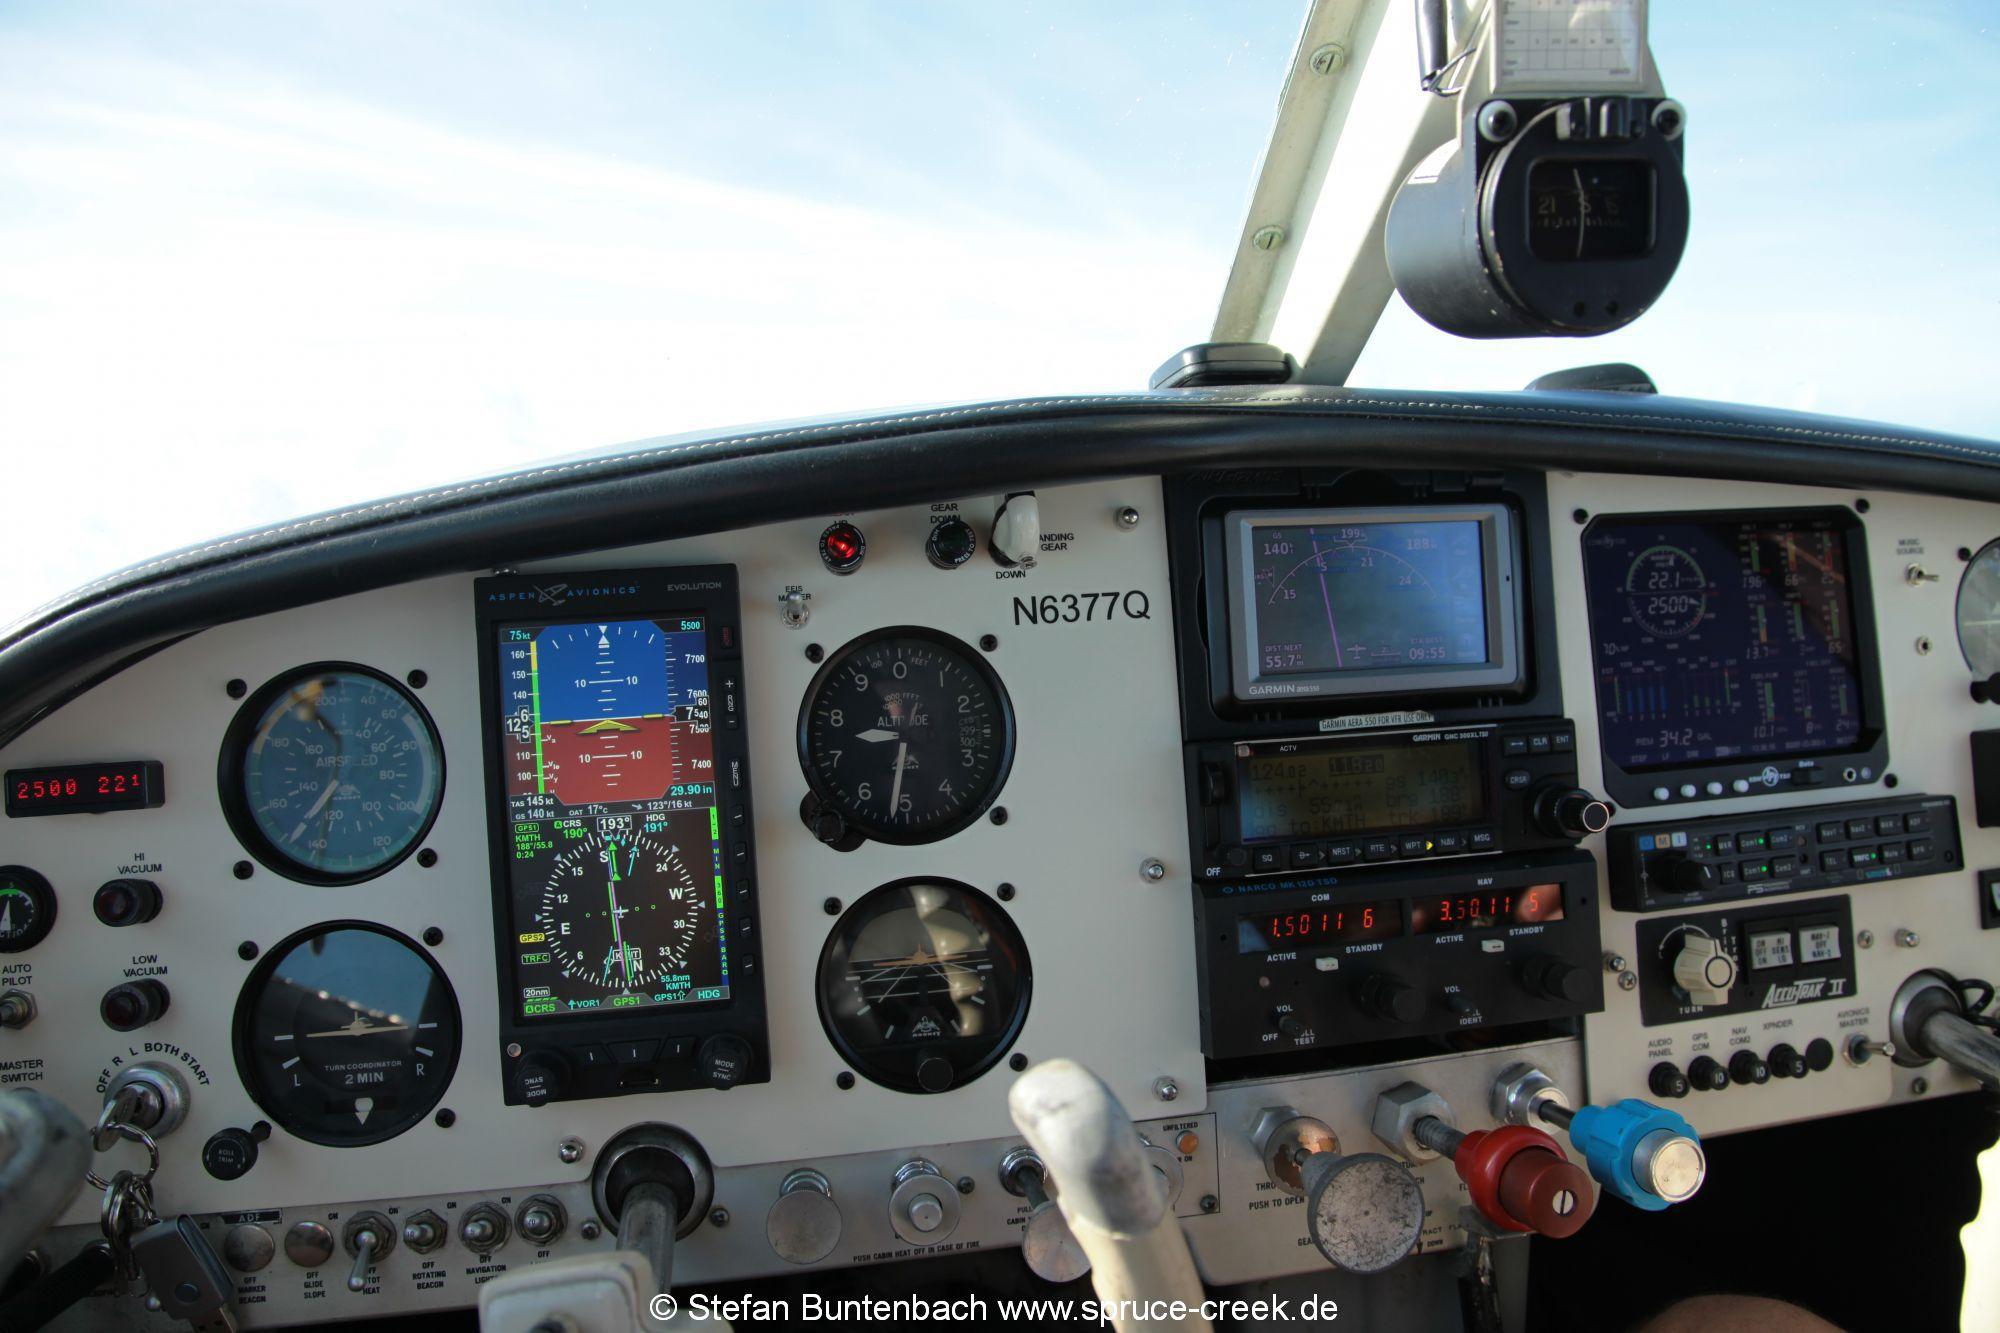 Mooney M20F N3677Q Cockpit with Aspen 1000 Pro PFD and JPI EDM 930 Engine Monitor